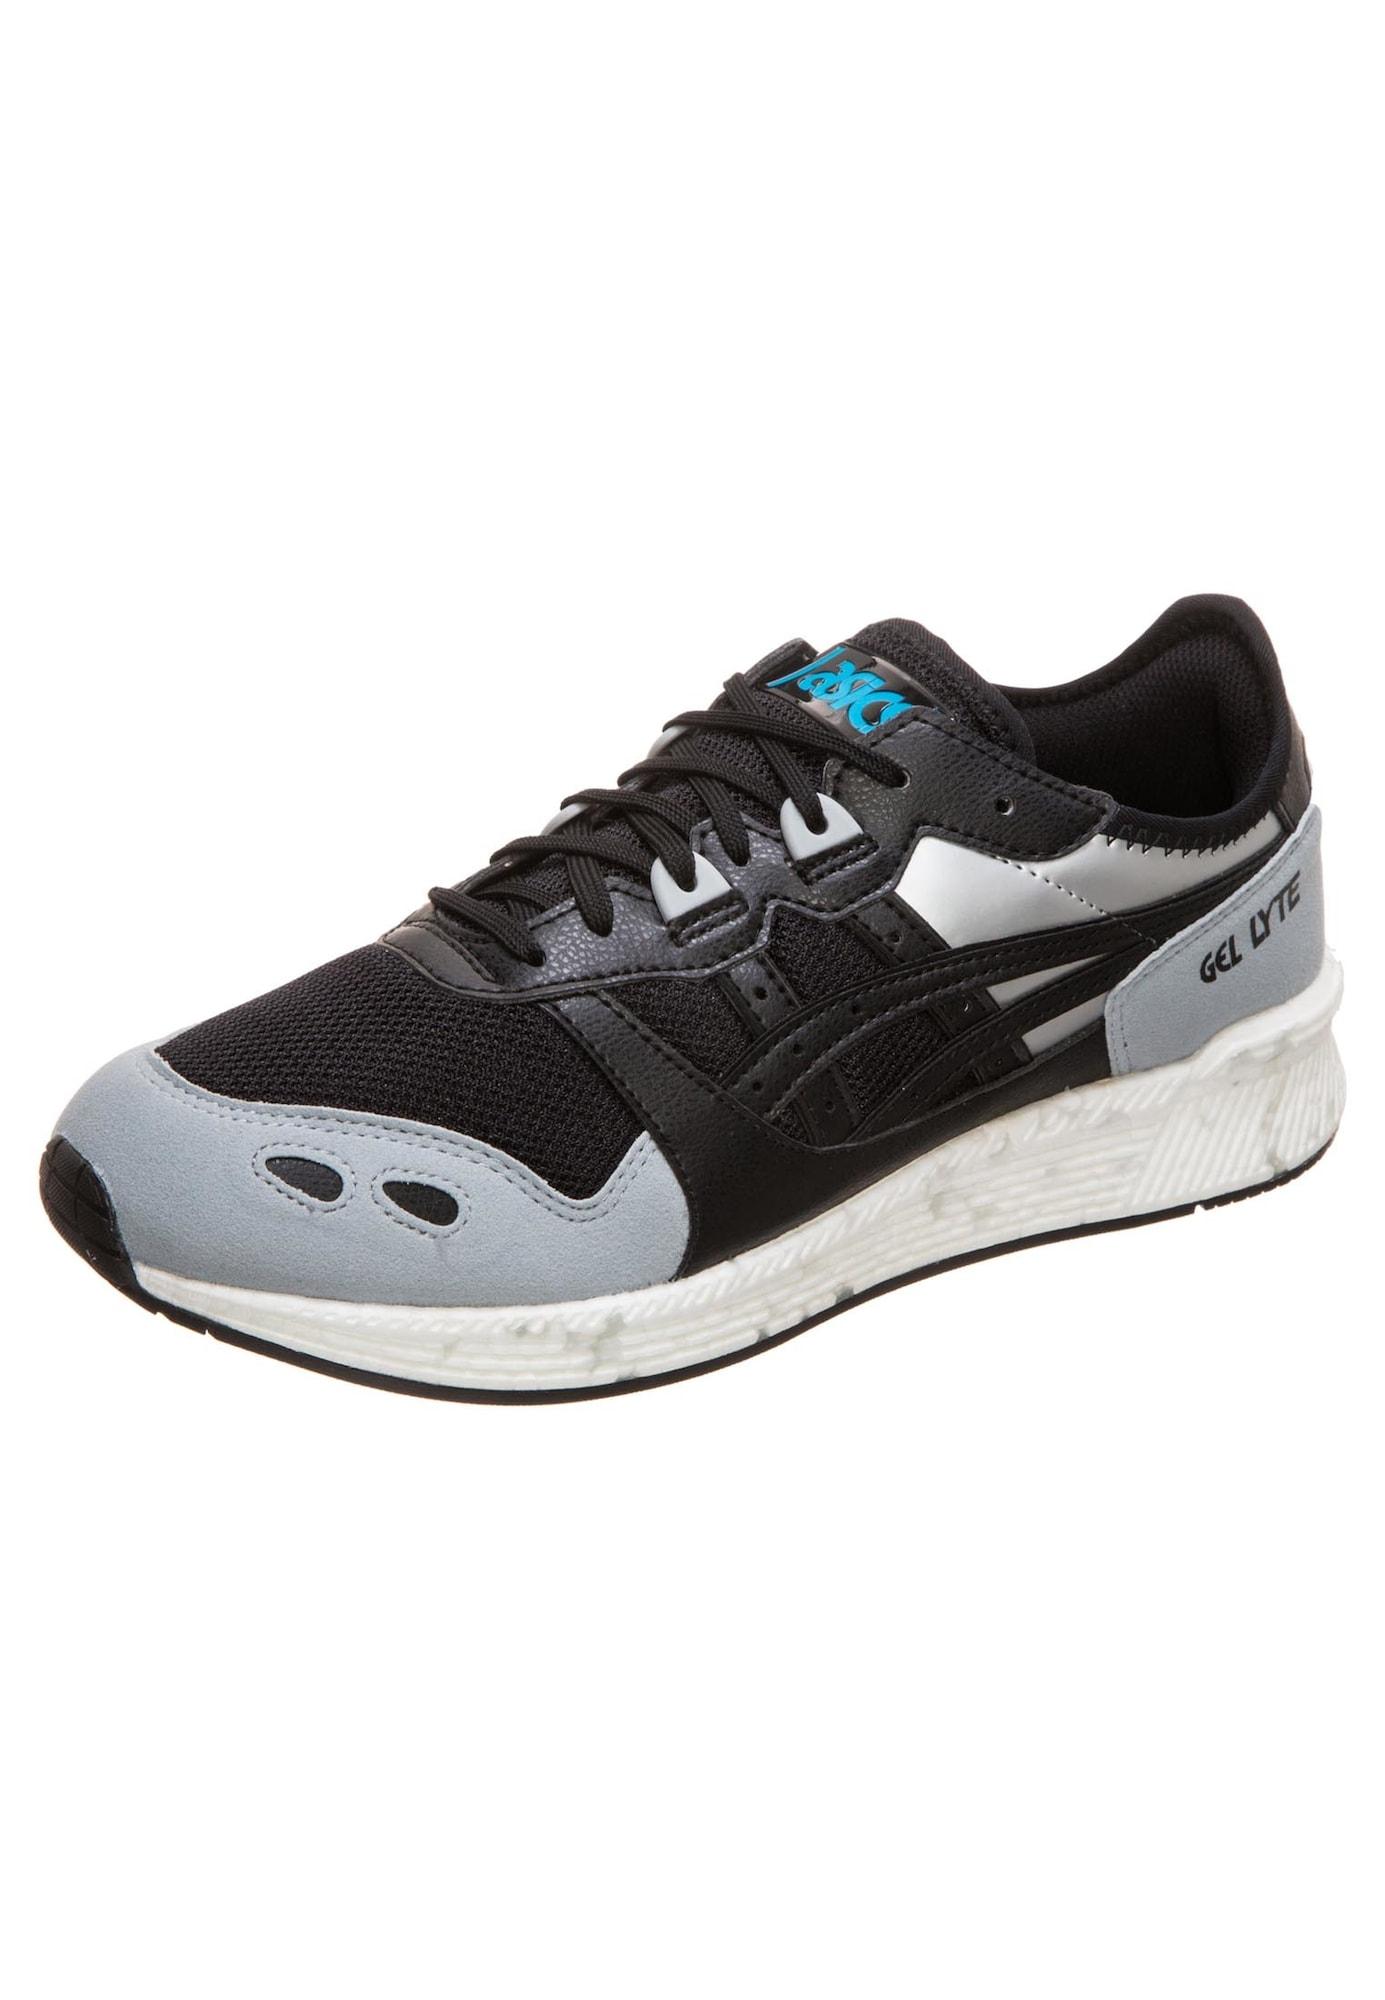 Asics Tiger, Heren Sneakers laag 'Hyper Gel-Lyte', aqua / zwart / zilver